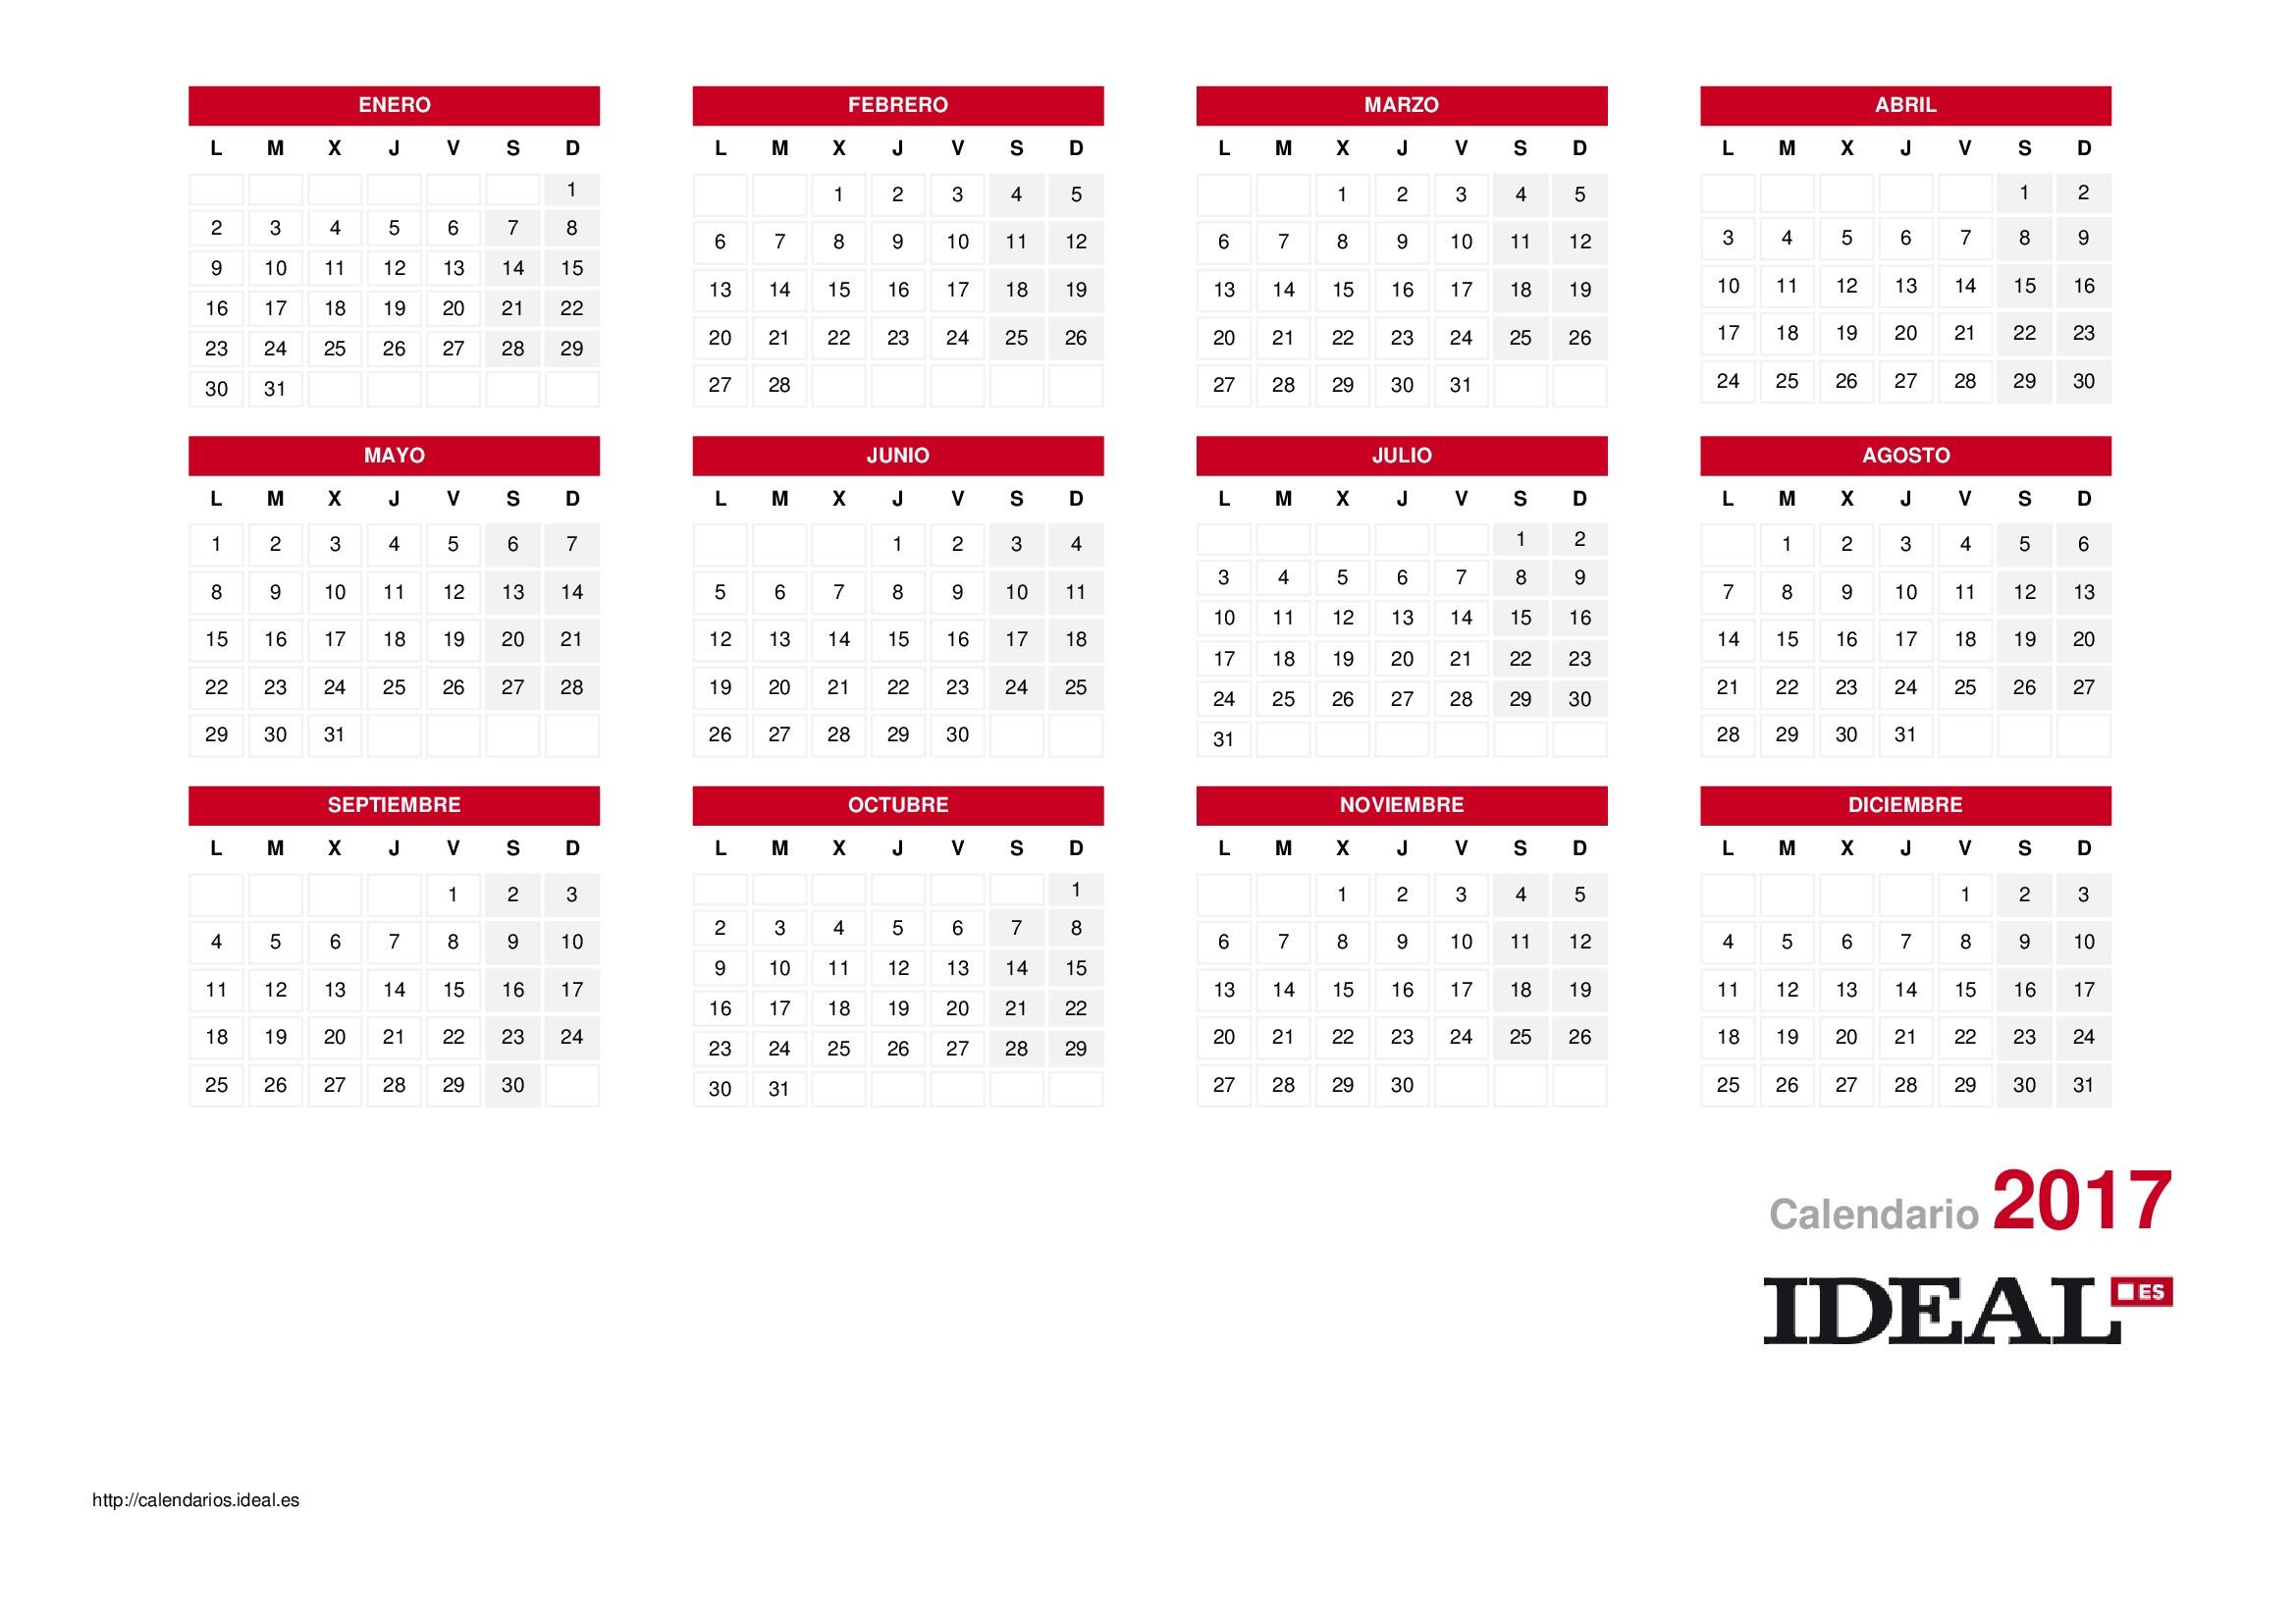 Calendario Enero 2019 Barcelona Recientes Calendario Laboral De 2018 Calendarios Ideal Das Festivos Of Calendario Enero 2019 Barcelona Recientes Calendario De Inscripciones En Maternal Ps Et Ms 2018 2019